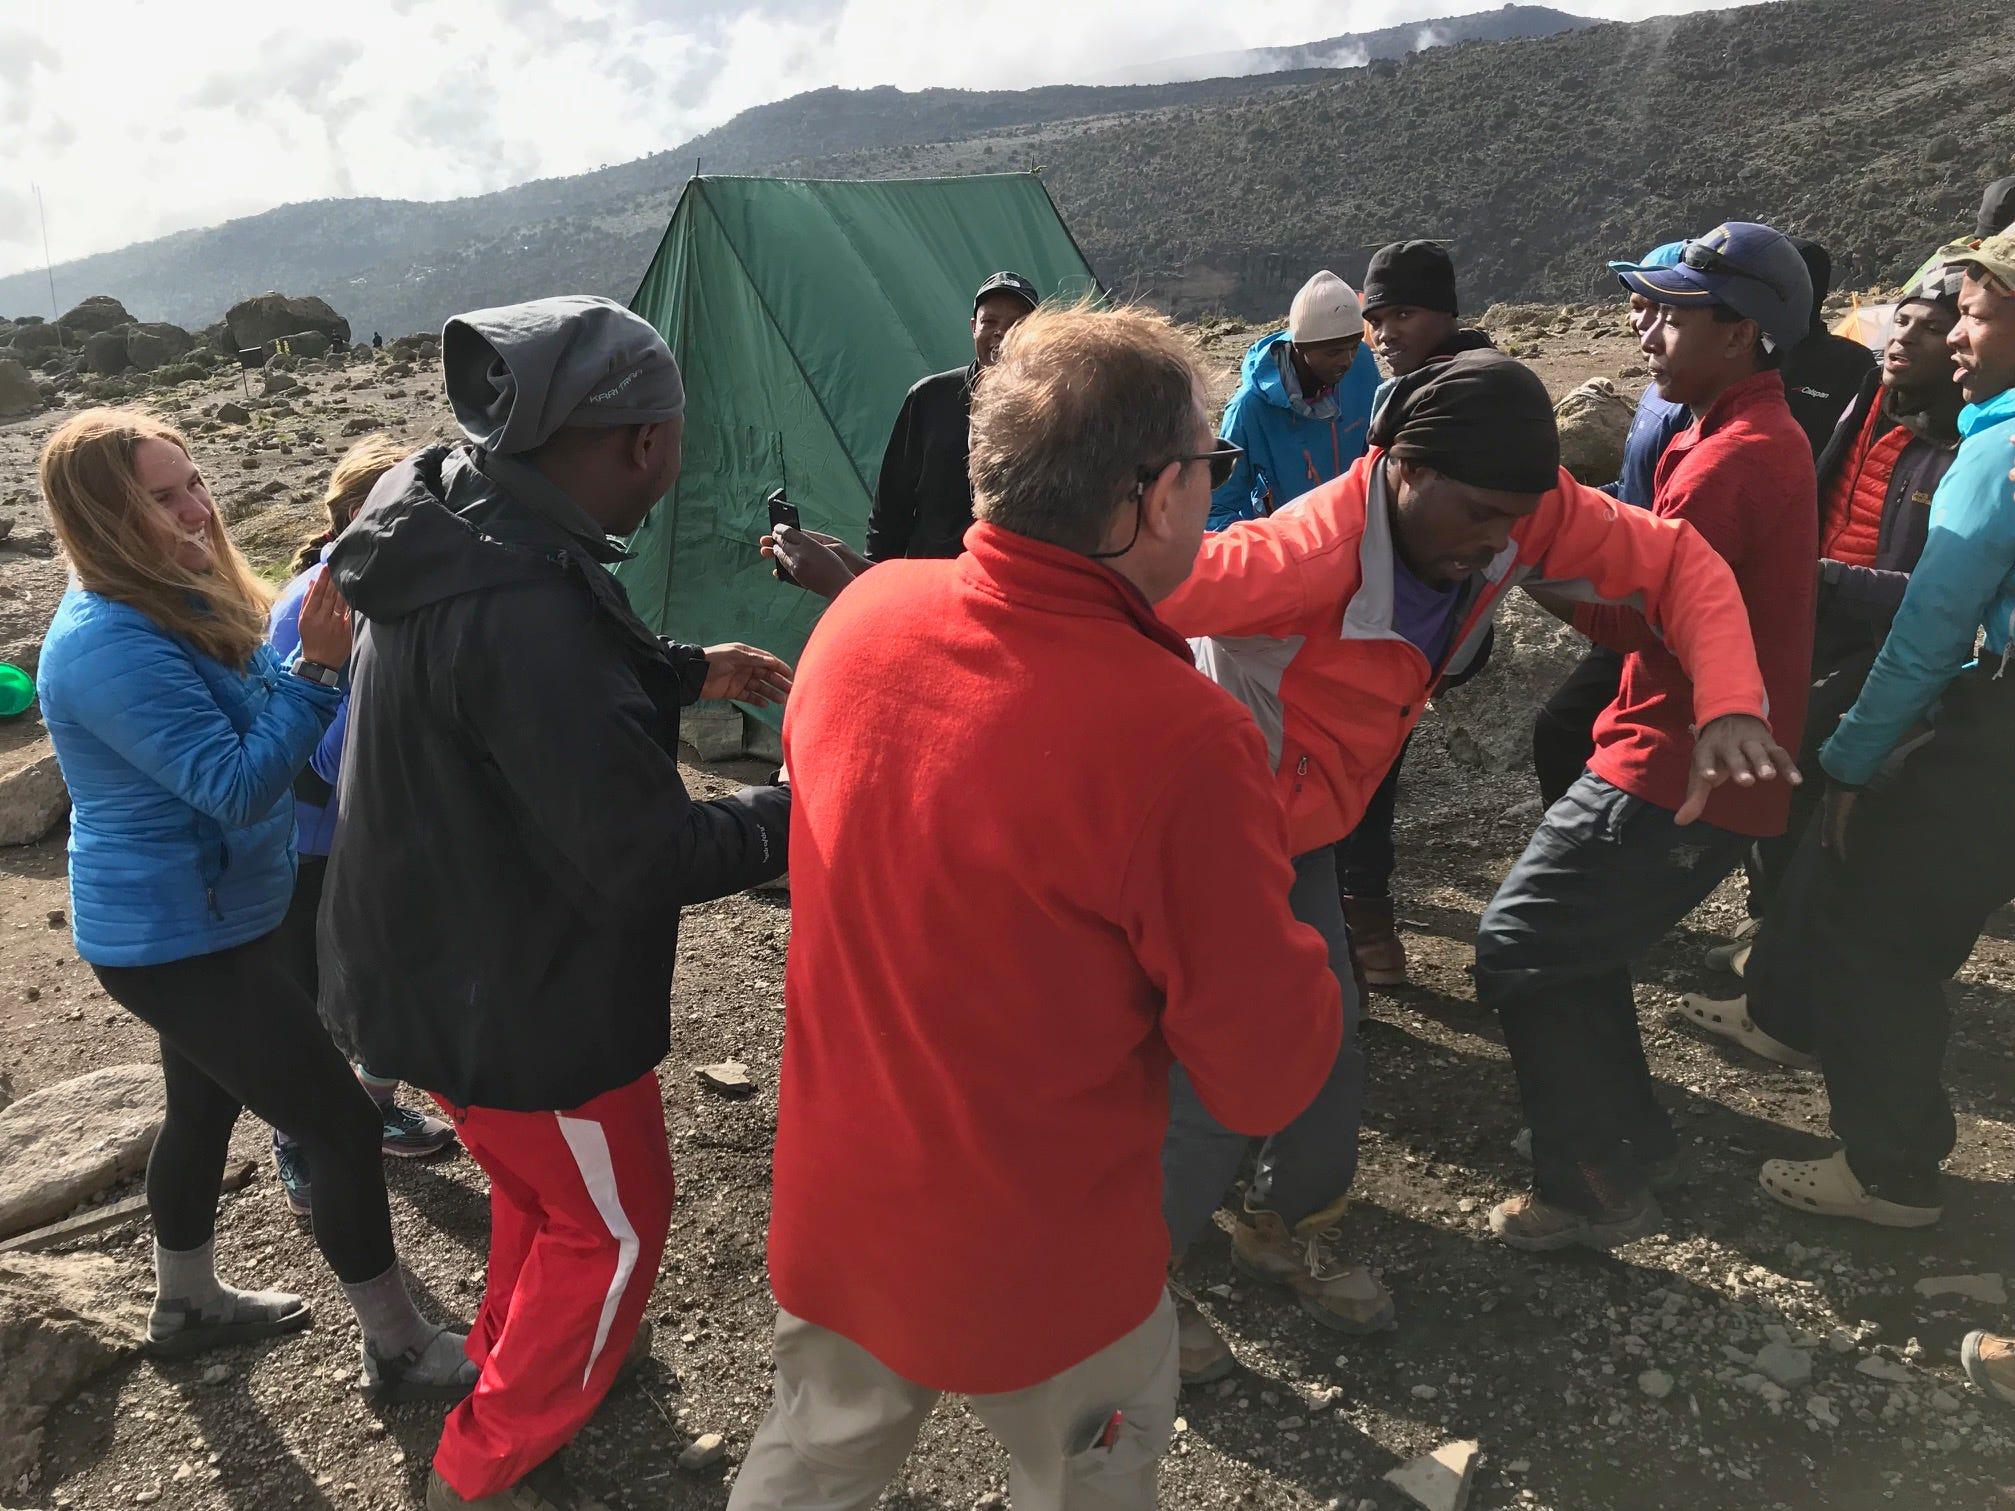 An evening dance party Jordan Grantz, John Grantz, Elliott Grantz Mount Kilimanjaro, Tanzania